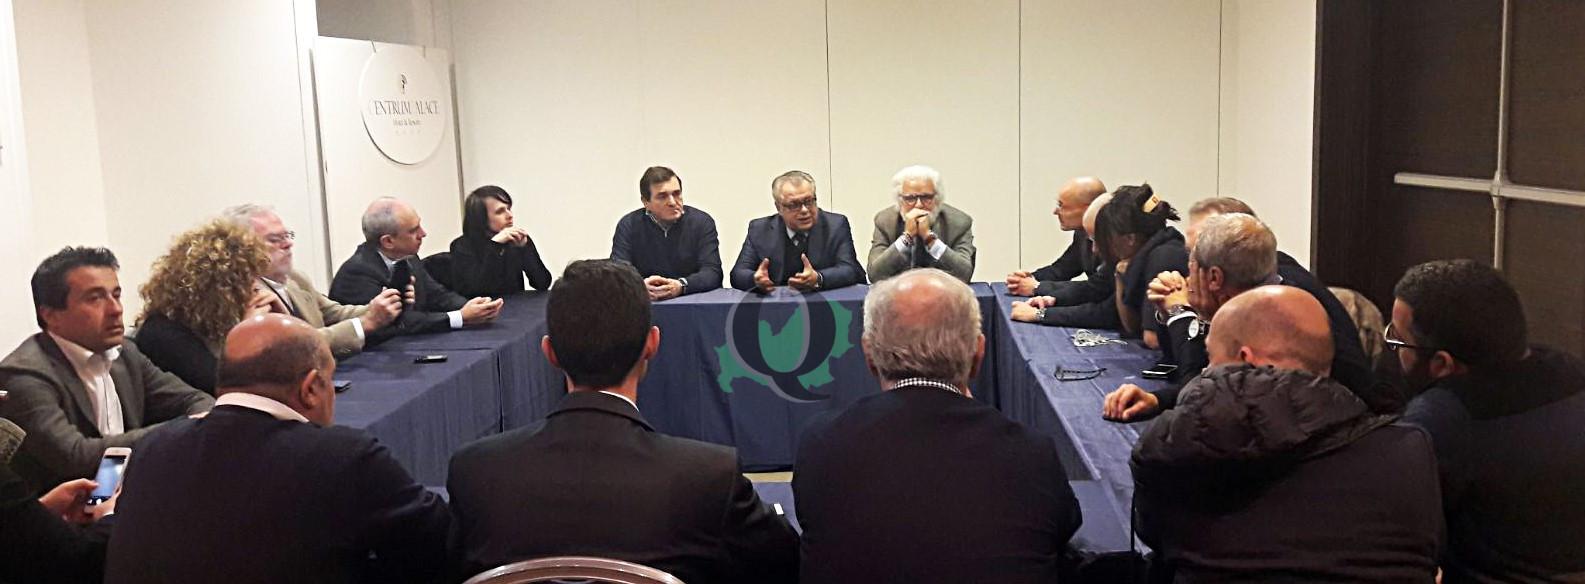 Post candidature Centrodestra in conclave, venerdì la conferenza